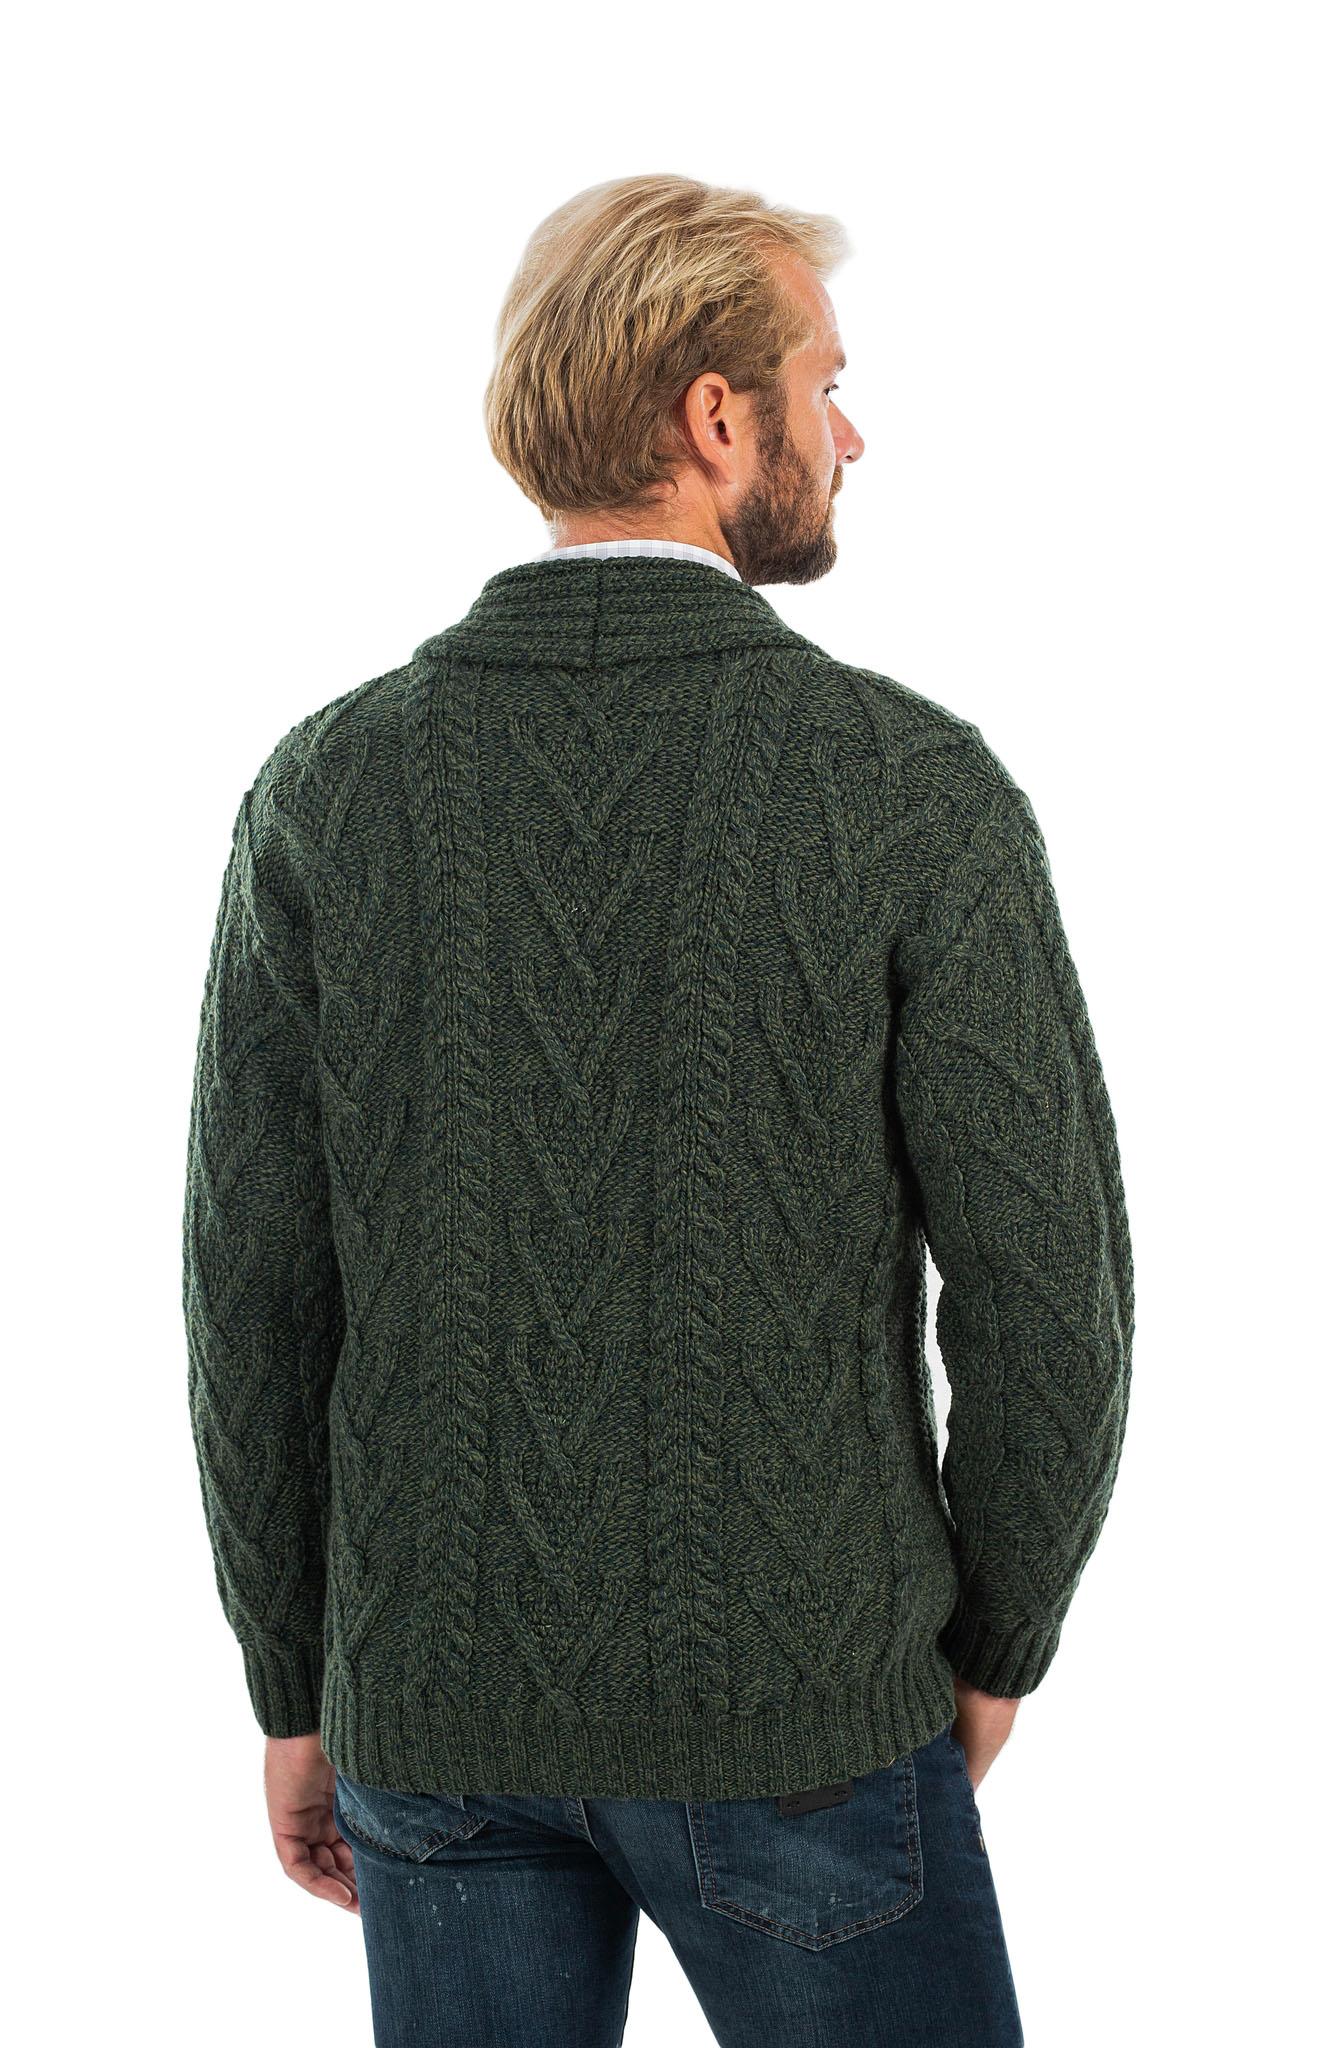 SAOL-Mens-Irish-Merino-Wool-Cardigan-Shawl-Collar-Front-Pockets-Aran-Cable-Knit thumbnail 13